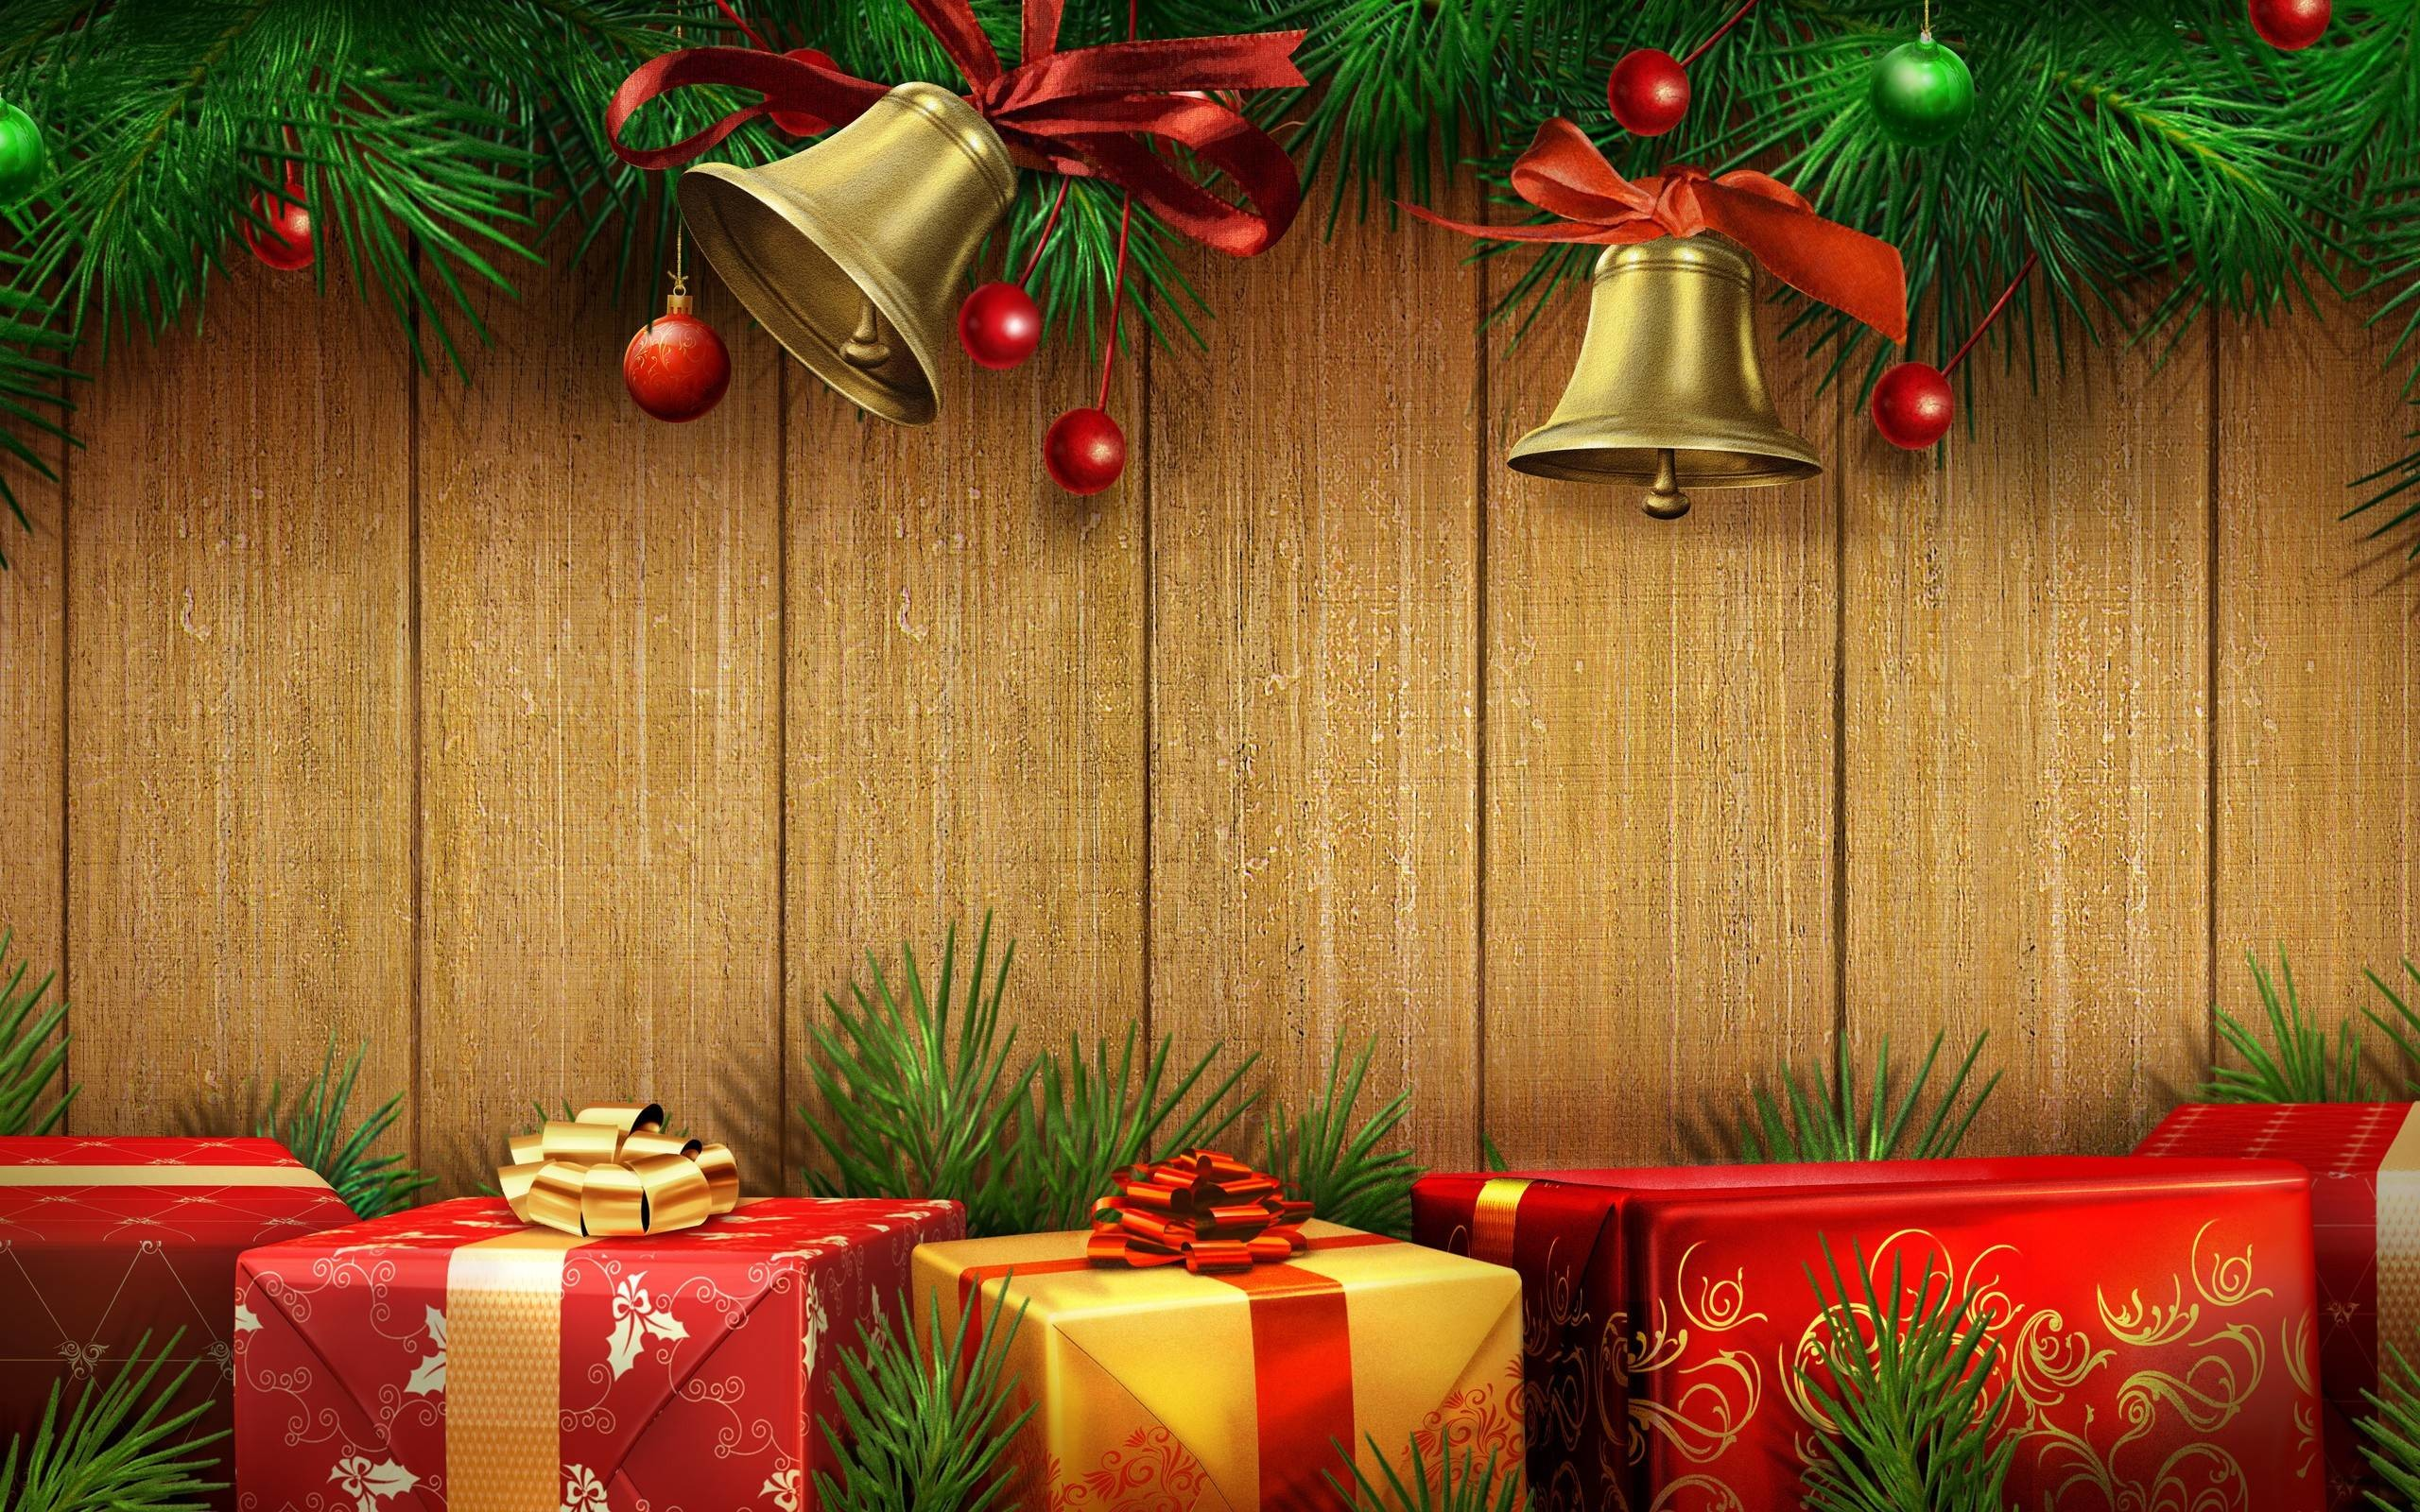 Xmas Stuff For > Christmas Gifts Wallpaper